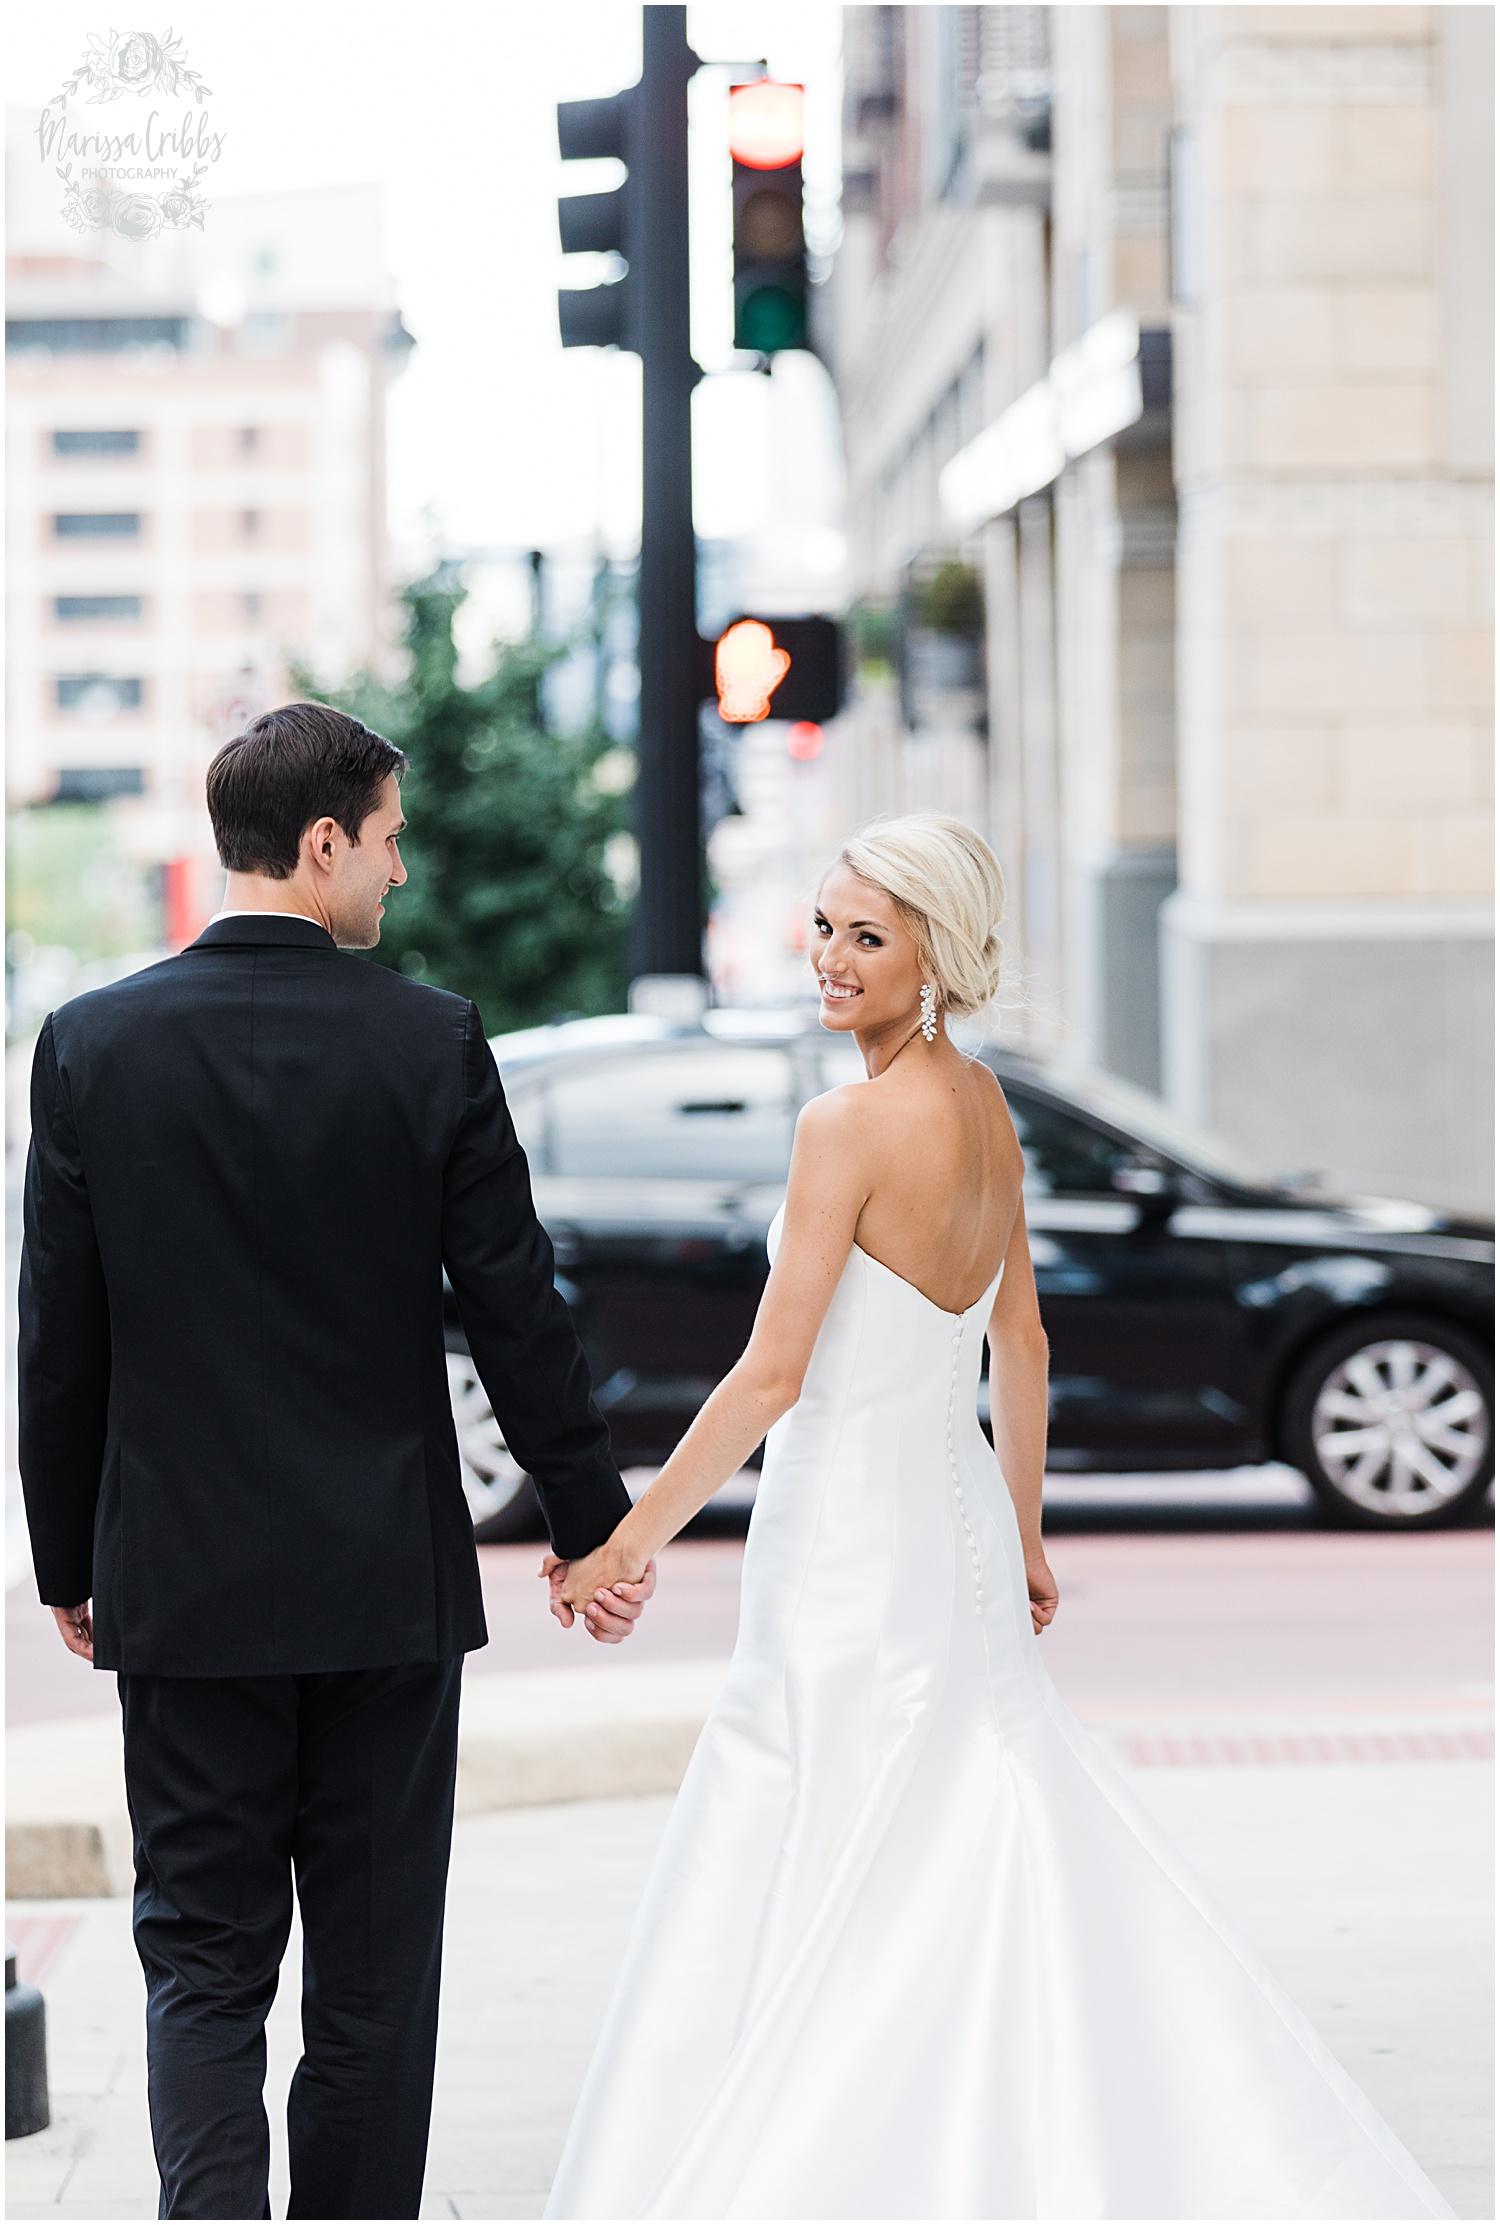 NOLL WEDDING | THE BRASS ON BALTIMORE | MARISSA CRIBBS PHOTOGRAPHY_6344.jpg